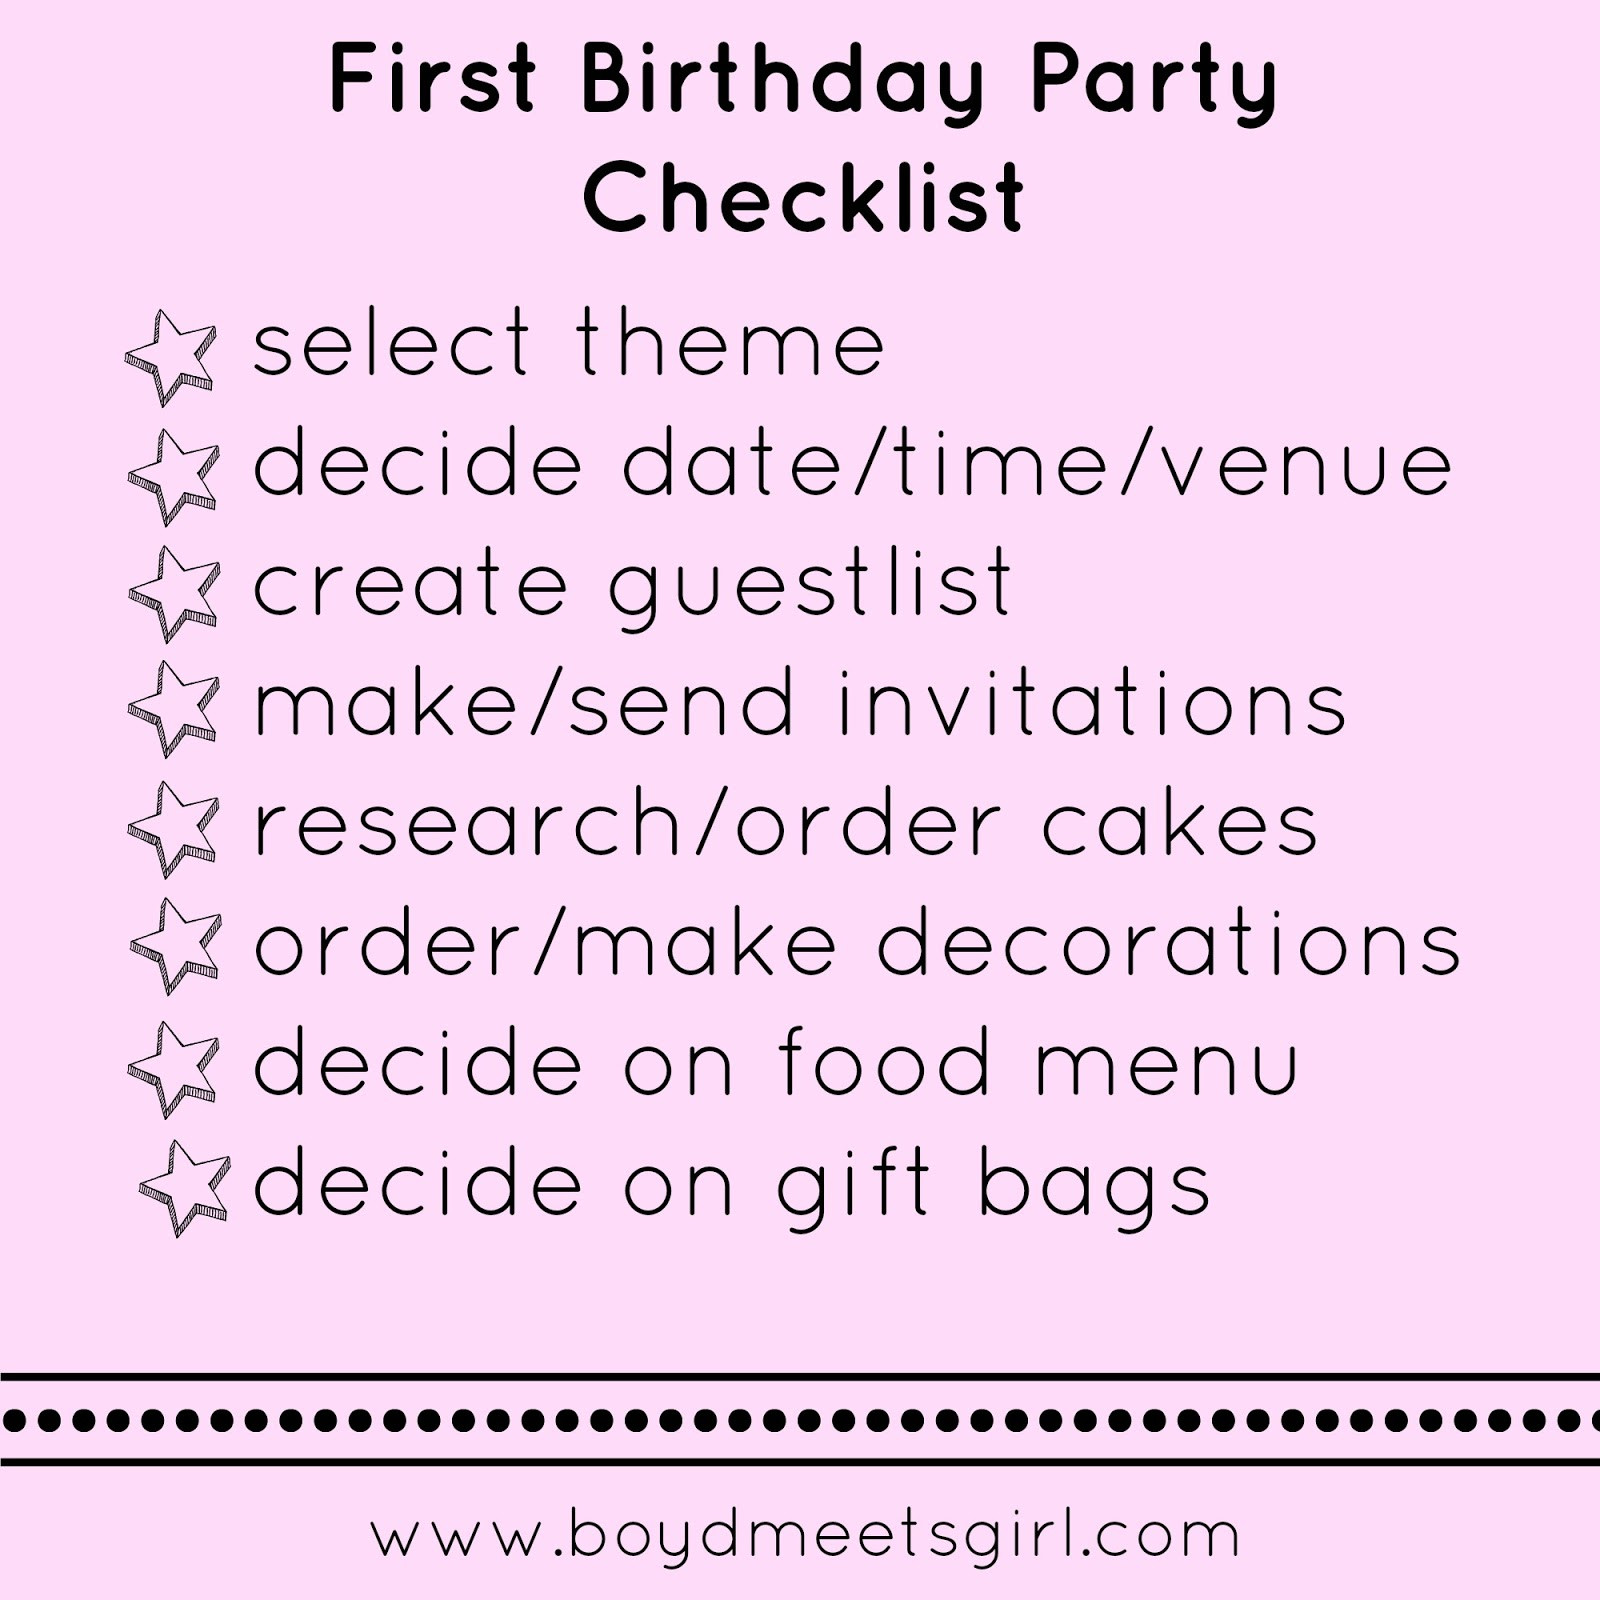 Best ideas about 1st Birthday Party Checklist . Save or Pin First Birthday Party Checklist Now.